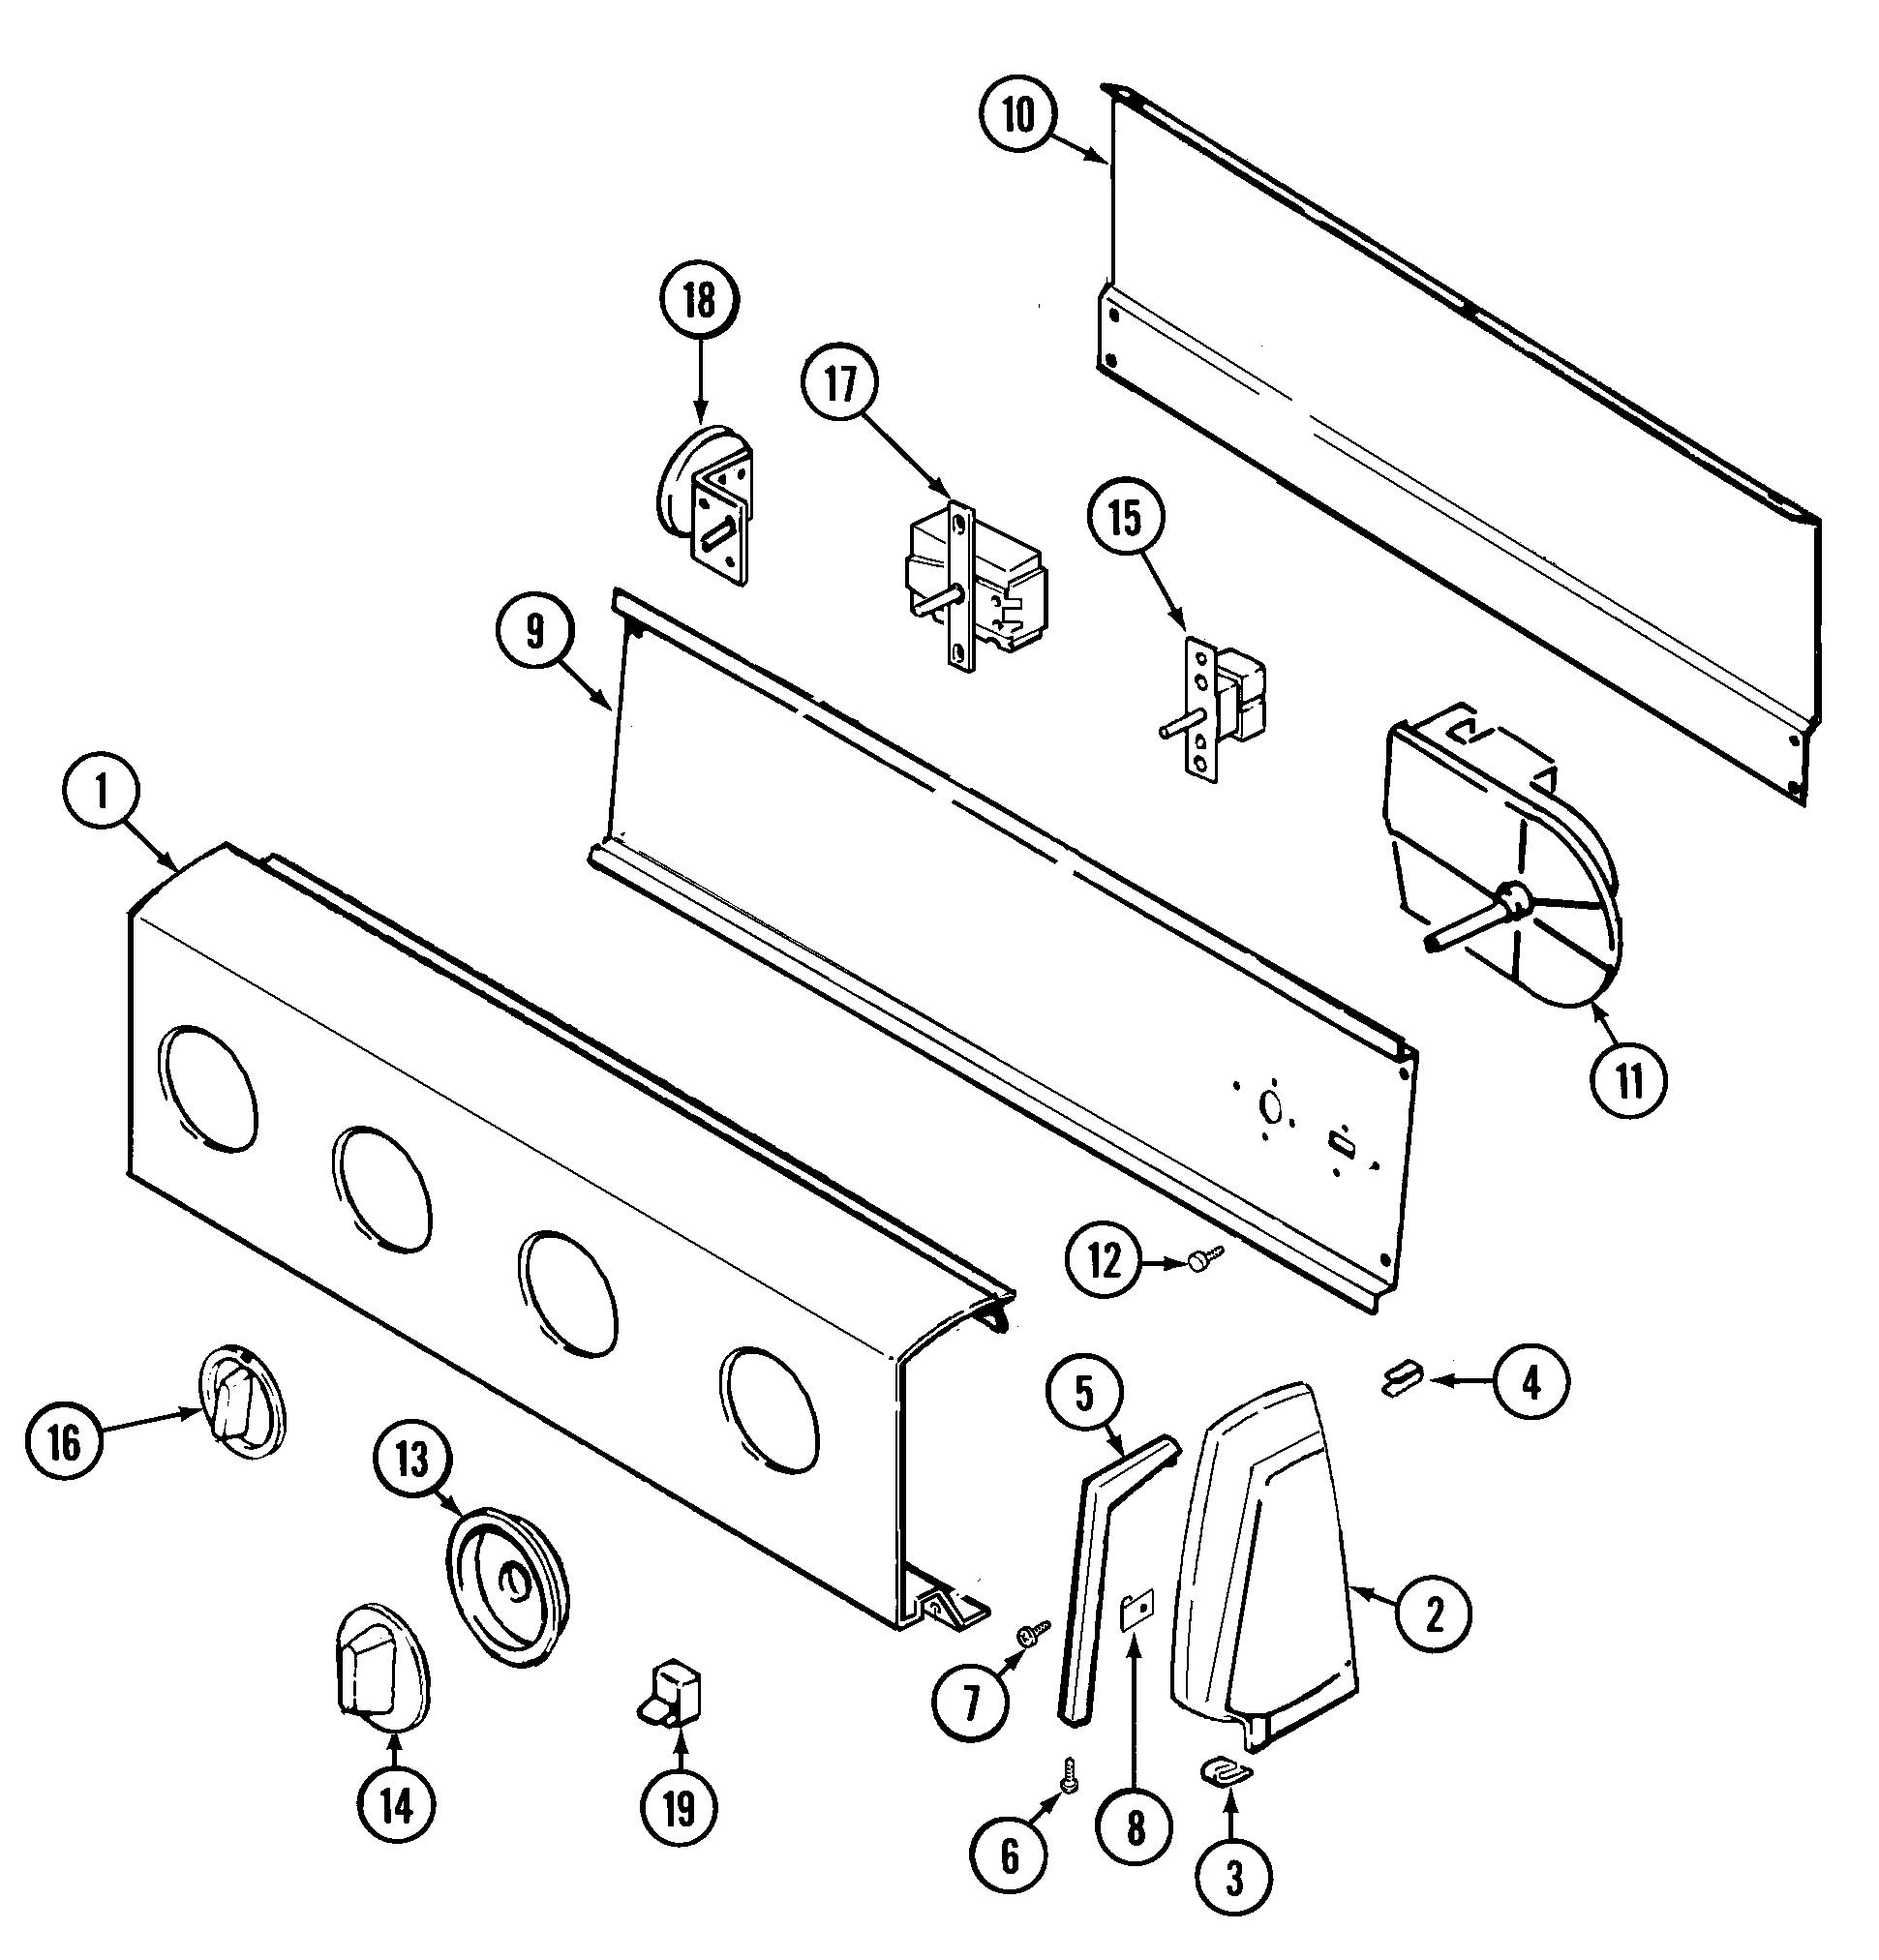 Maytag Washer Motor Wiring Diagram from www.appliancetimers.ca